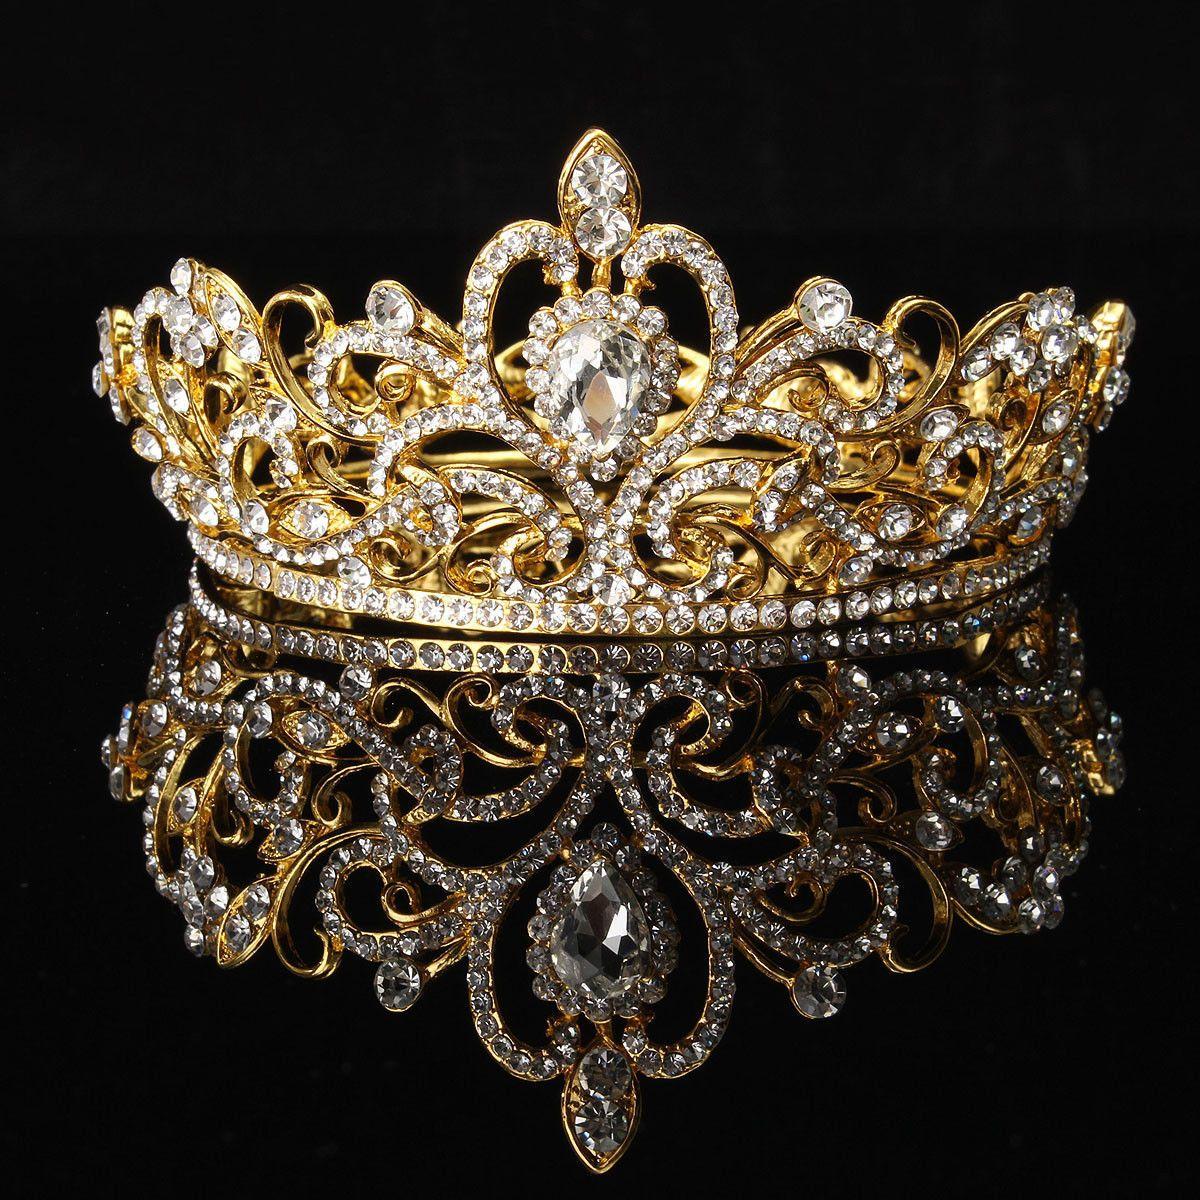 Bride Gold Silver Rhinestone Crystal Crown Tiara Head Jewelry Princess  Wedding 1b57b771b022